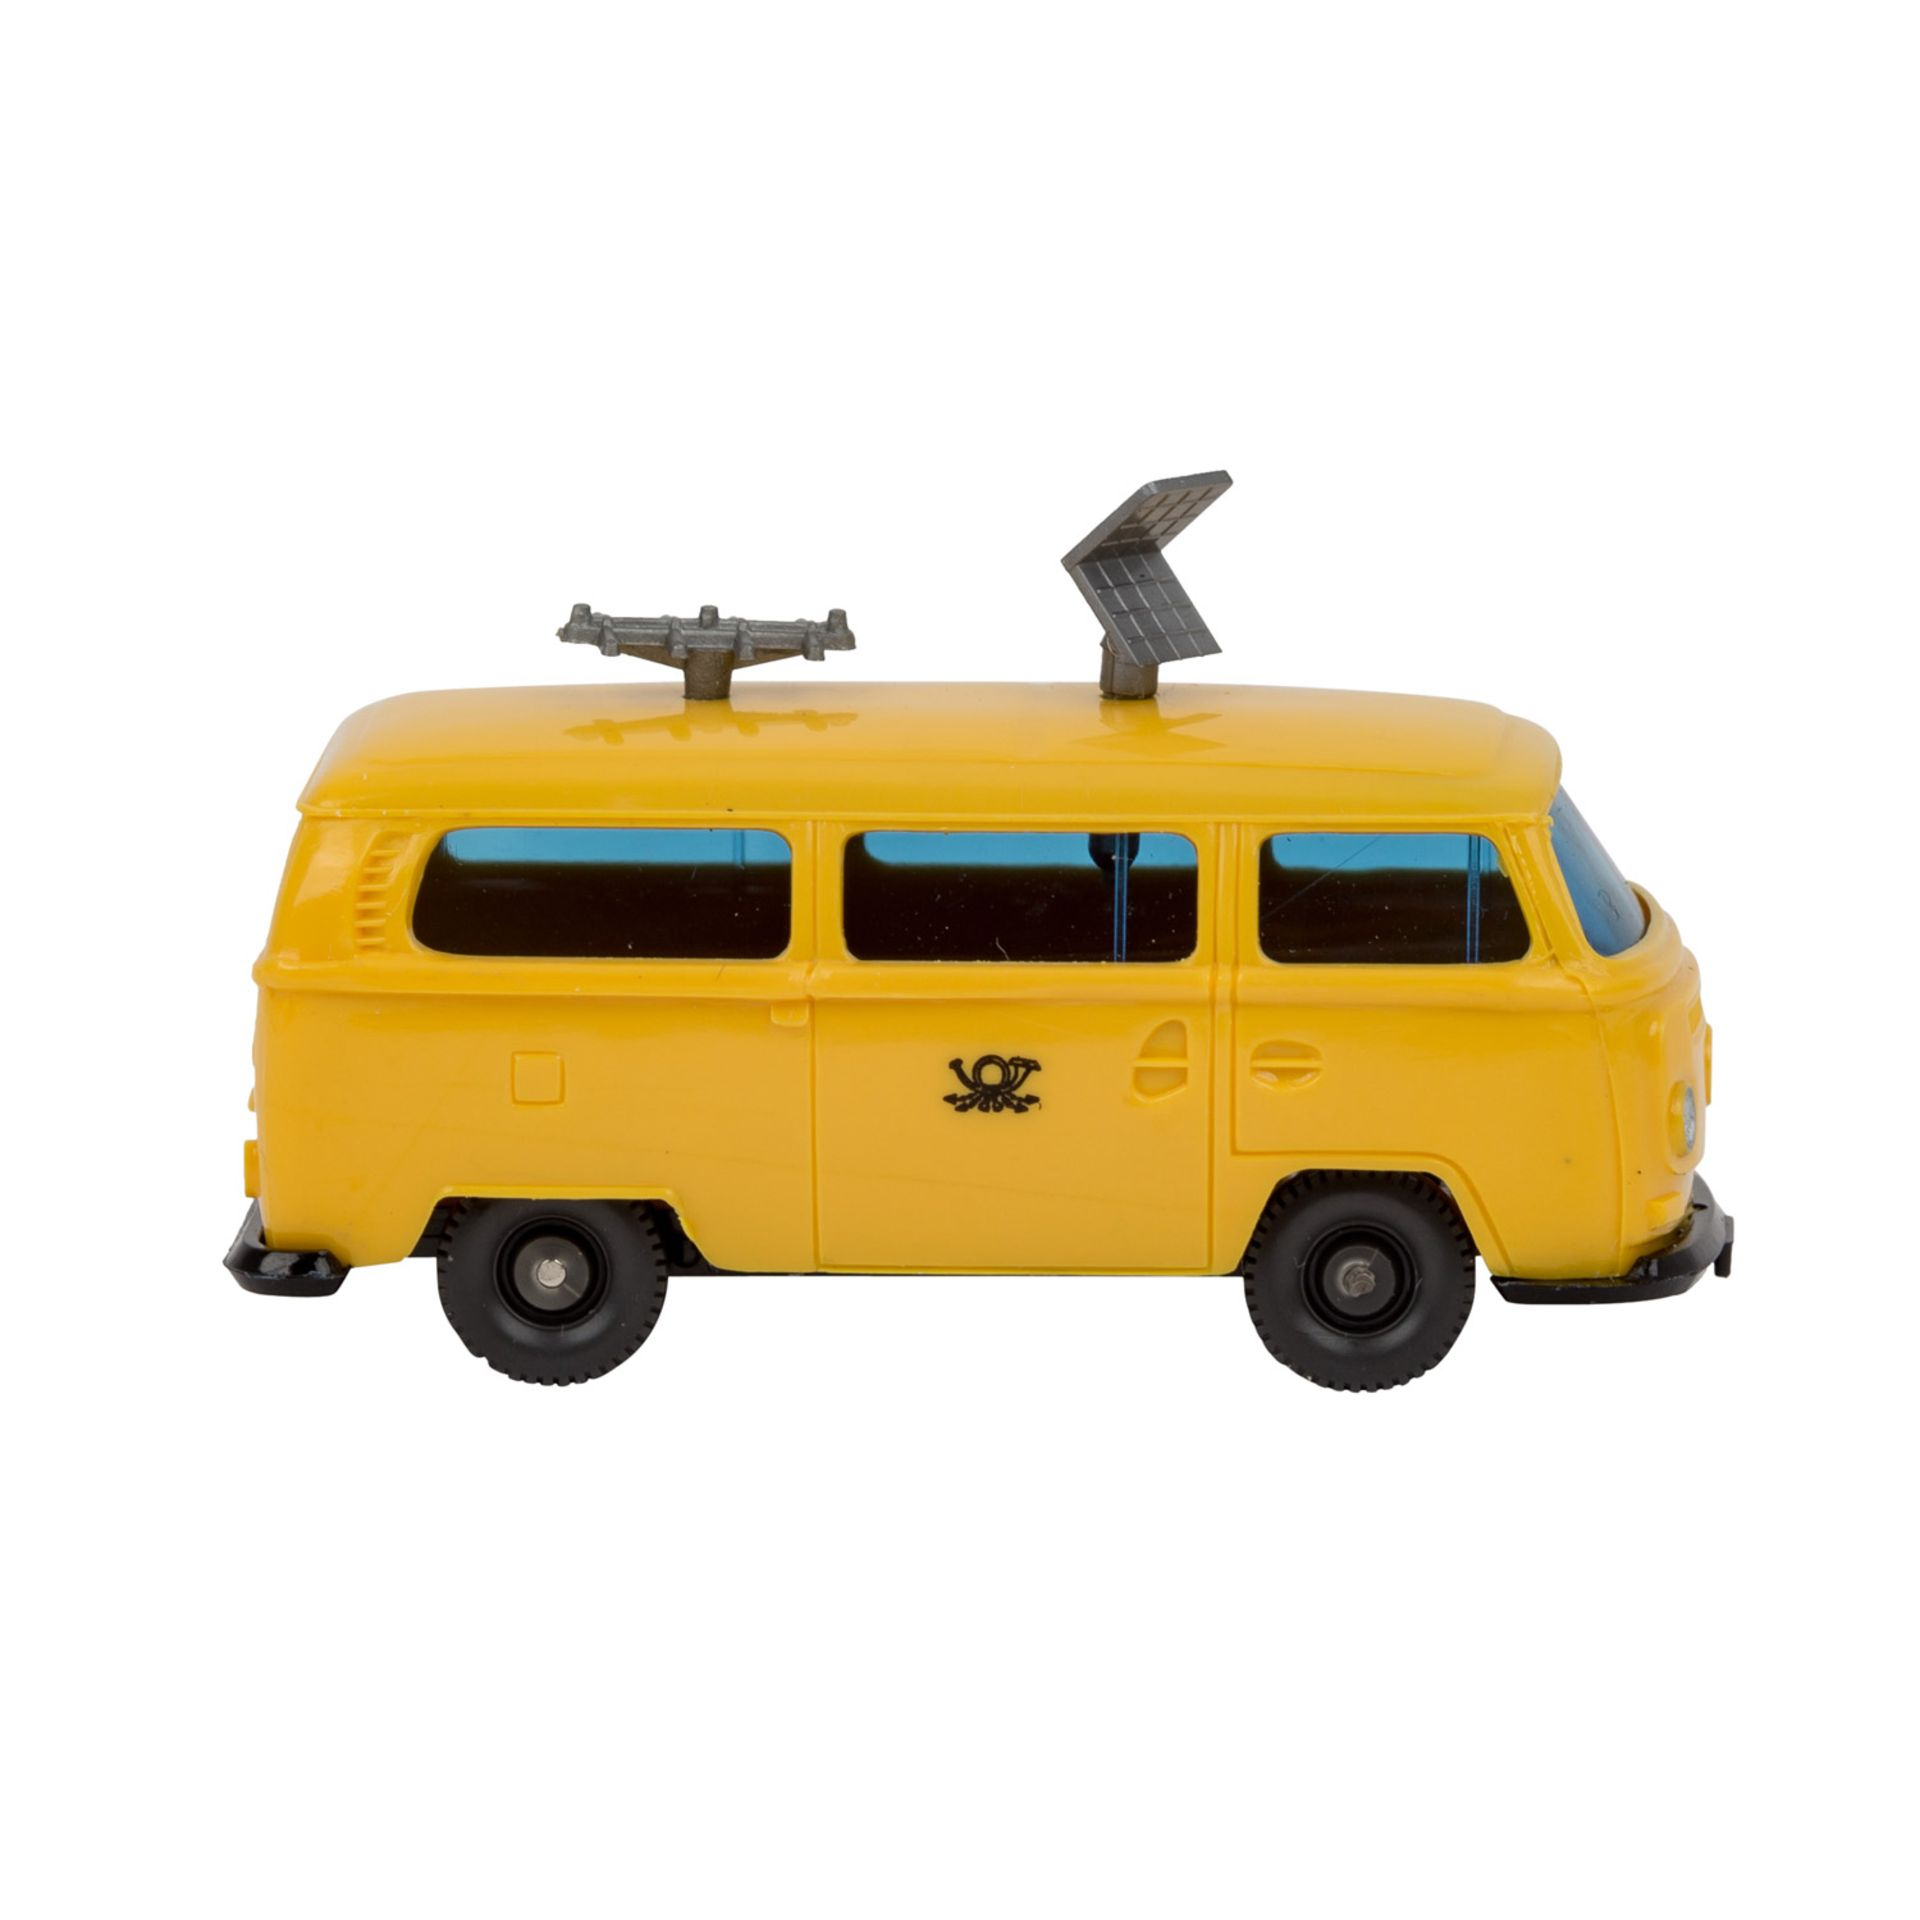 WIKING VW Bus T2 'Funkmesswagen', 1972-77,gelbe Karosserie, blaugetönte Verglasung, s - Image 4 of 5